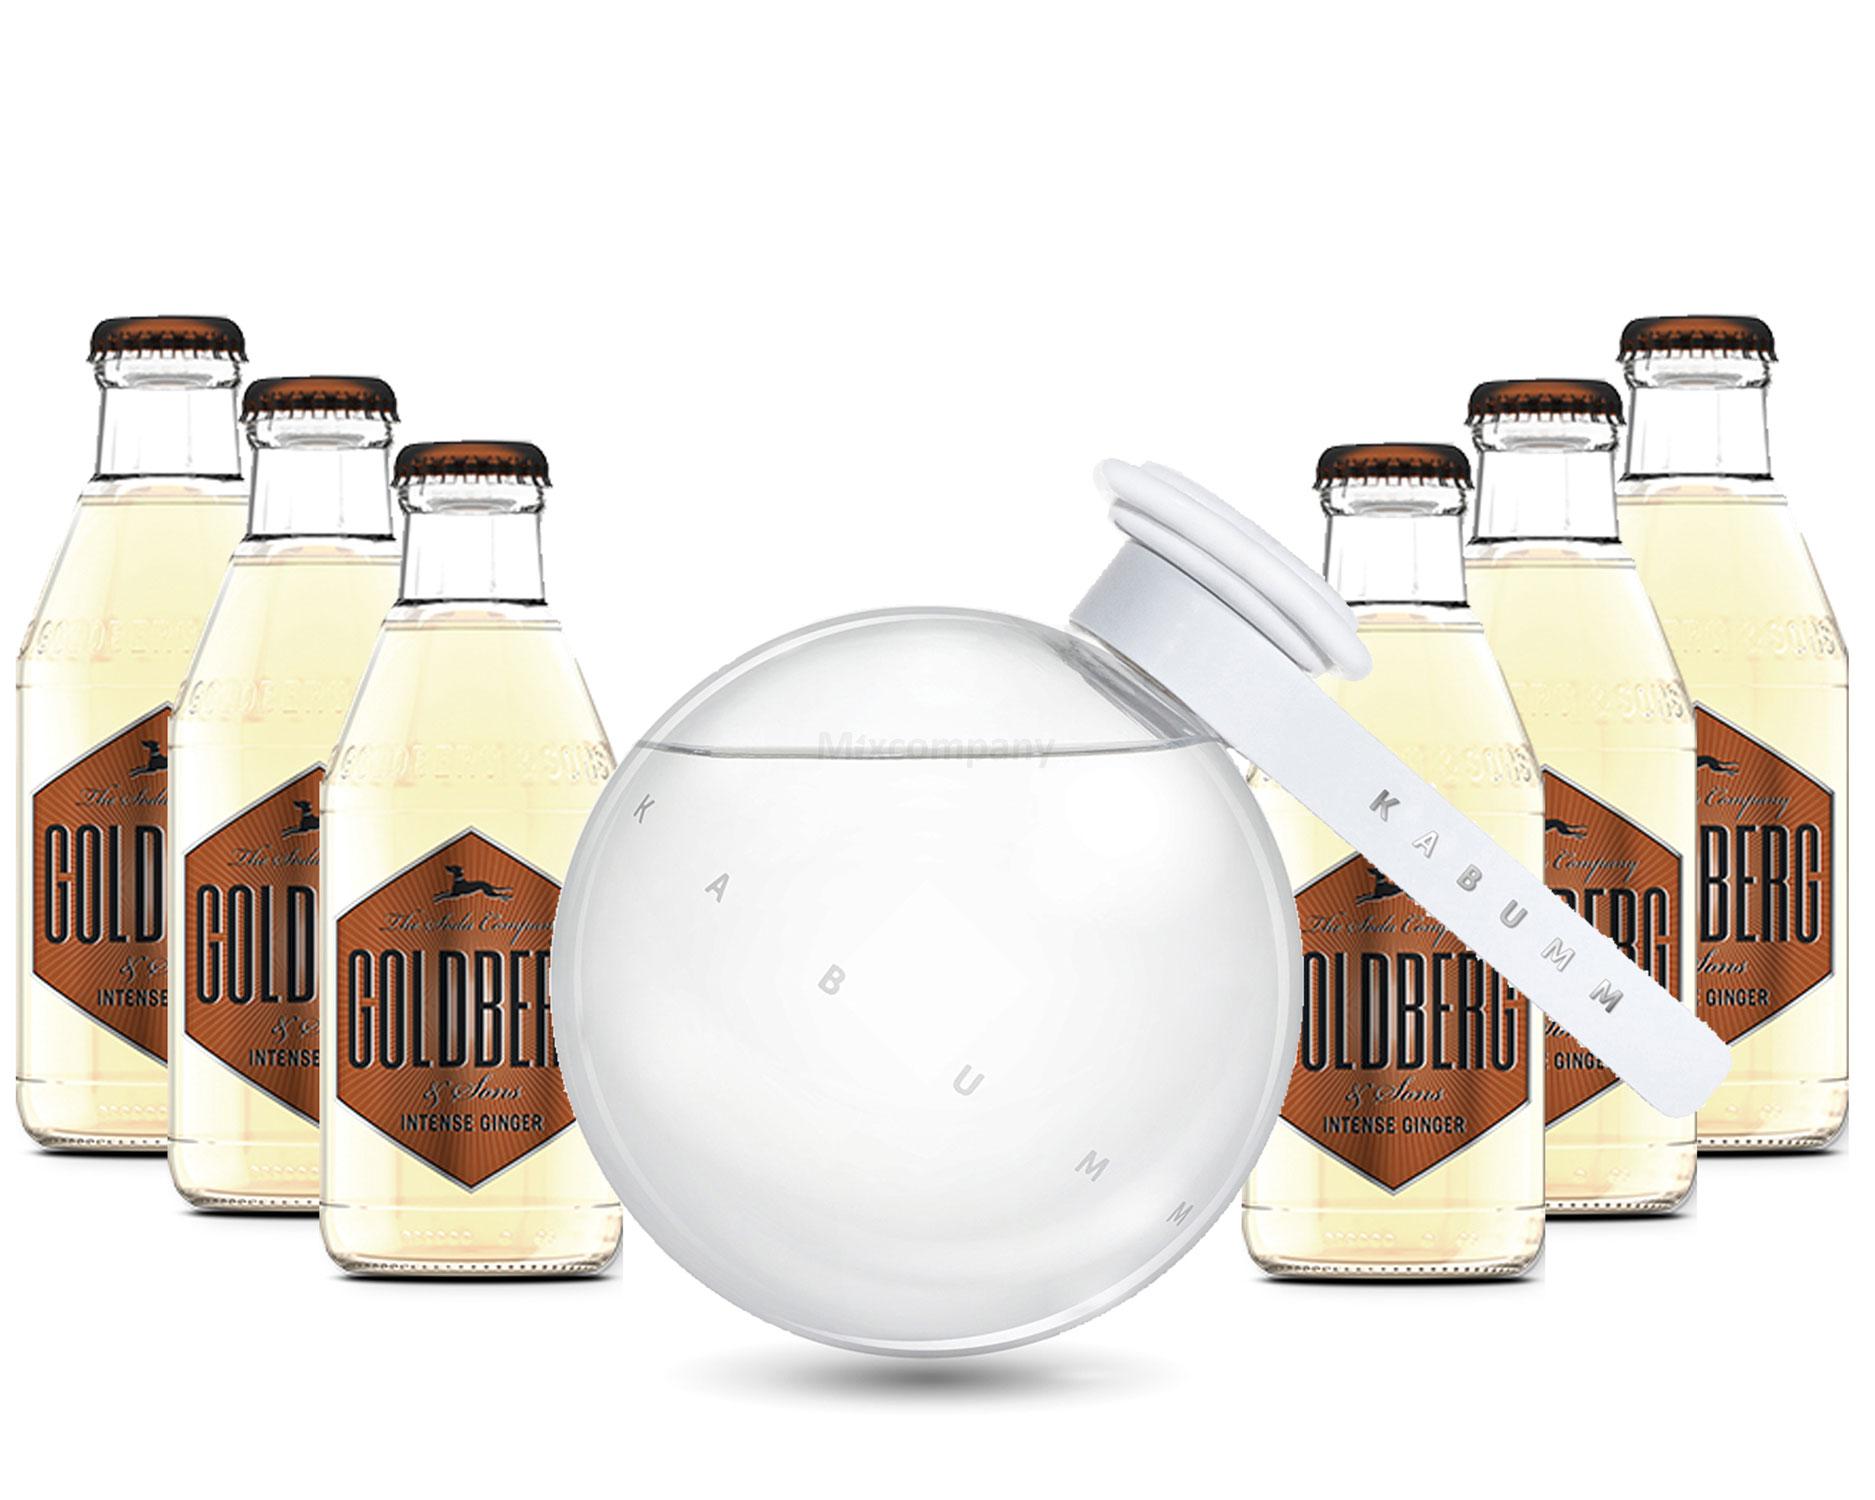 Moscow Mule Set - Kabumm Vodka 0,7l 700ml (40% Vol) + 6x Goldberg Intense Ginger 200ml - Inkl. Pfand MEHRWEG